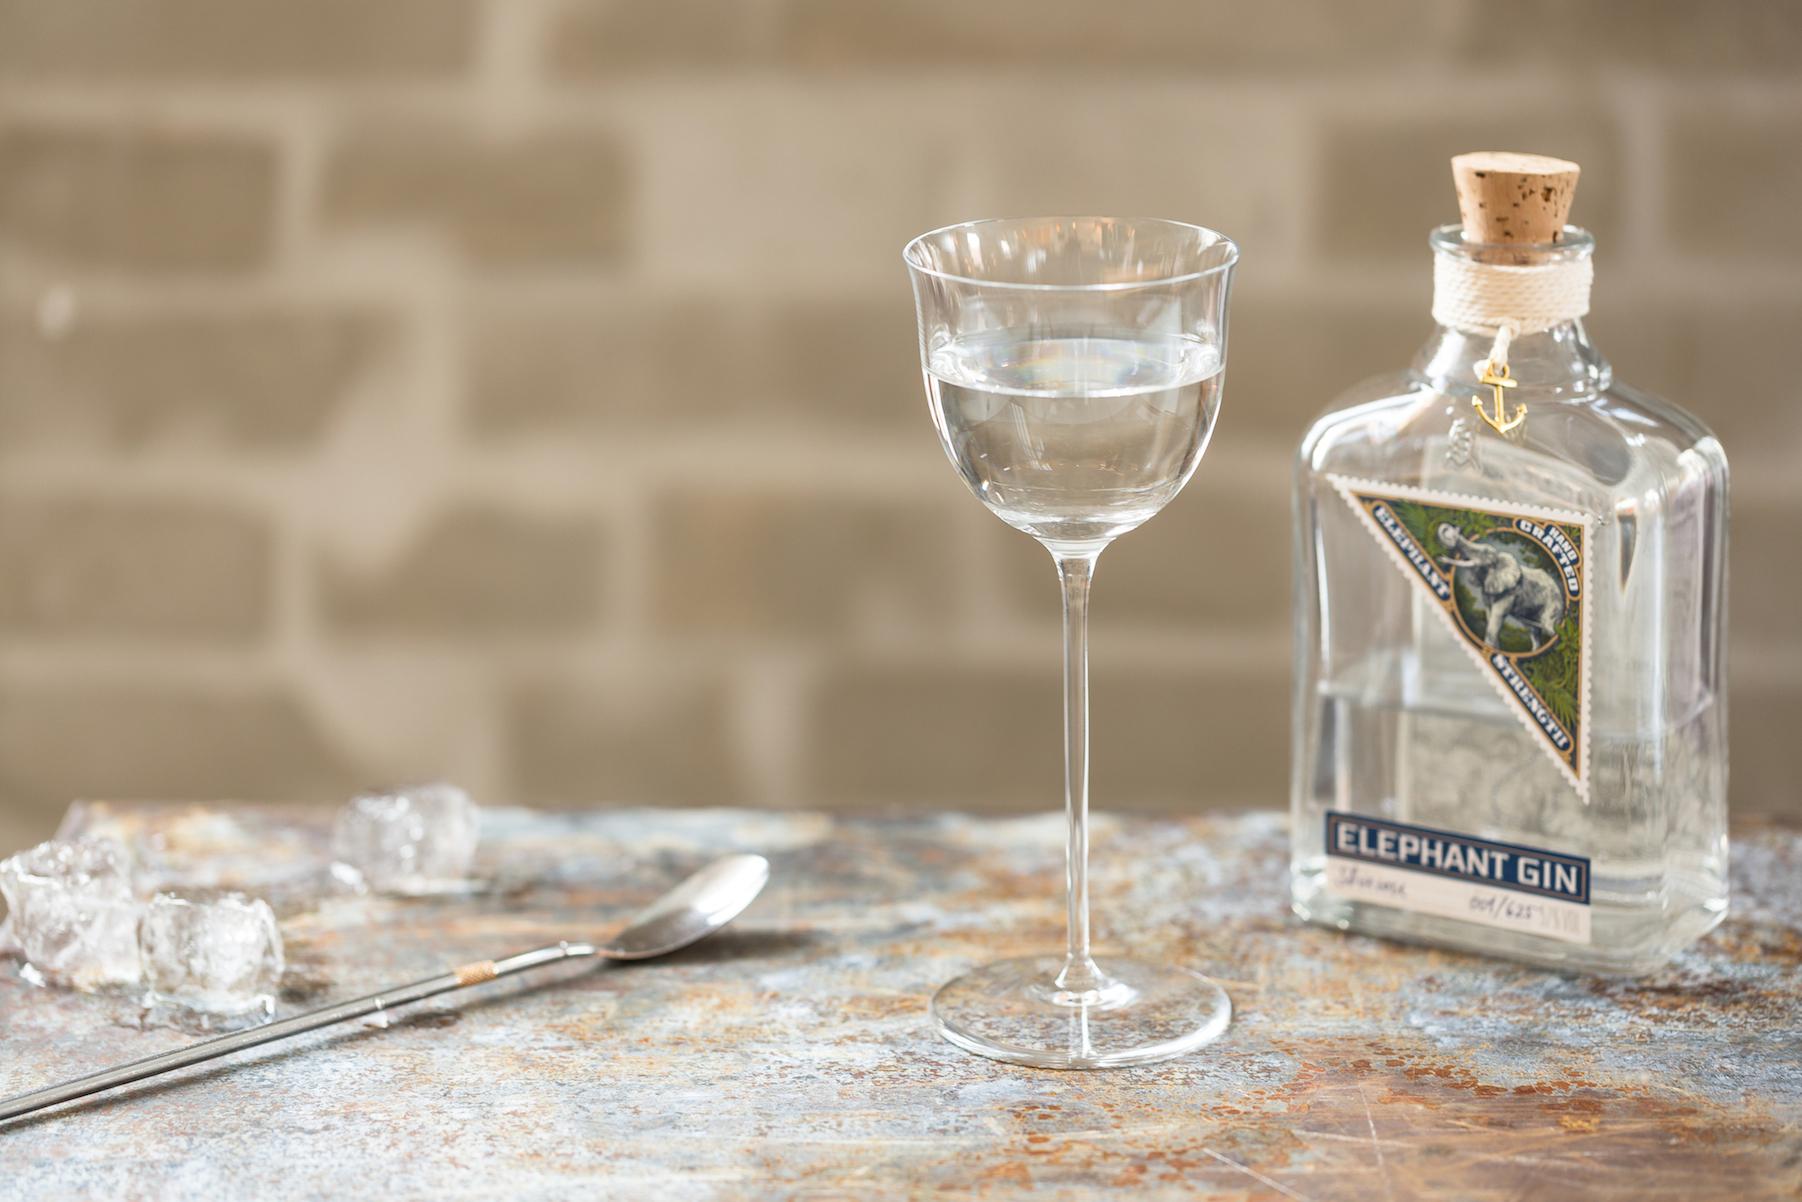 An African-Inspired Gin Bottled in Hamburg